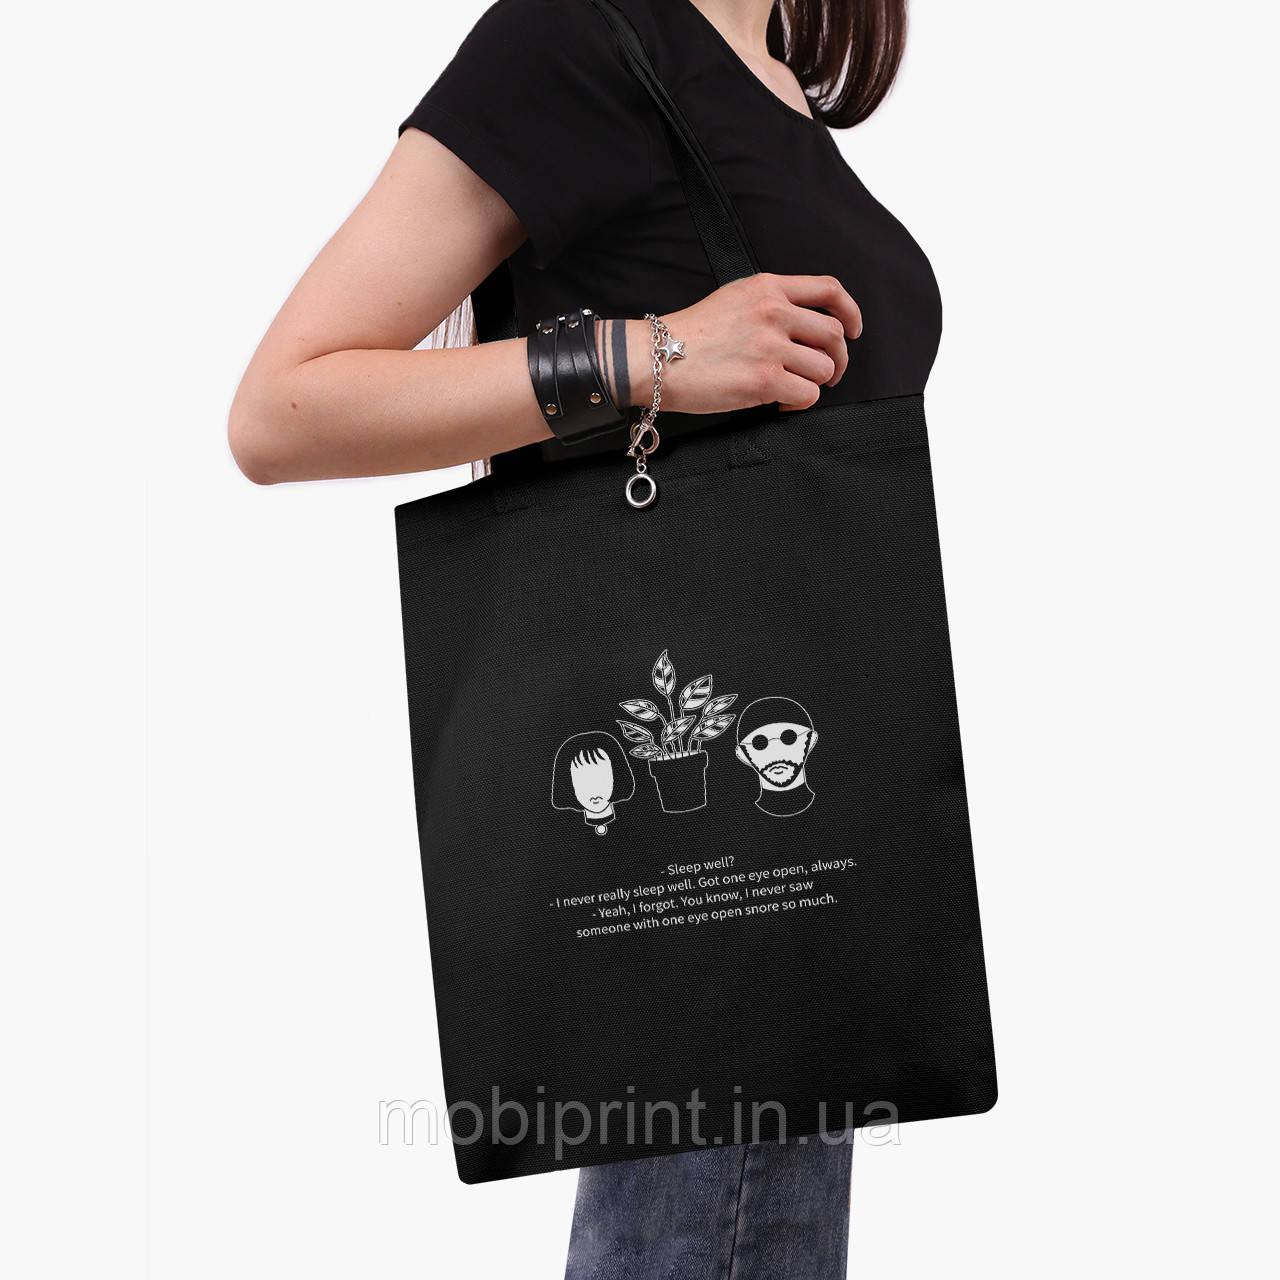 Еко сумка шоппер чорна Леон кілер (Leon) (9227-1453-2) экосумка шопер 41*35 см